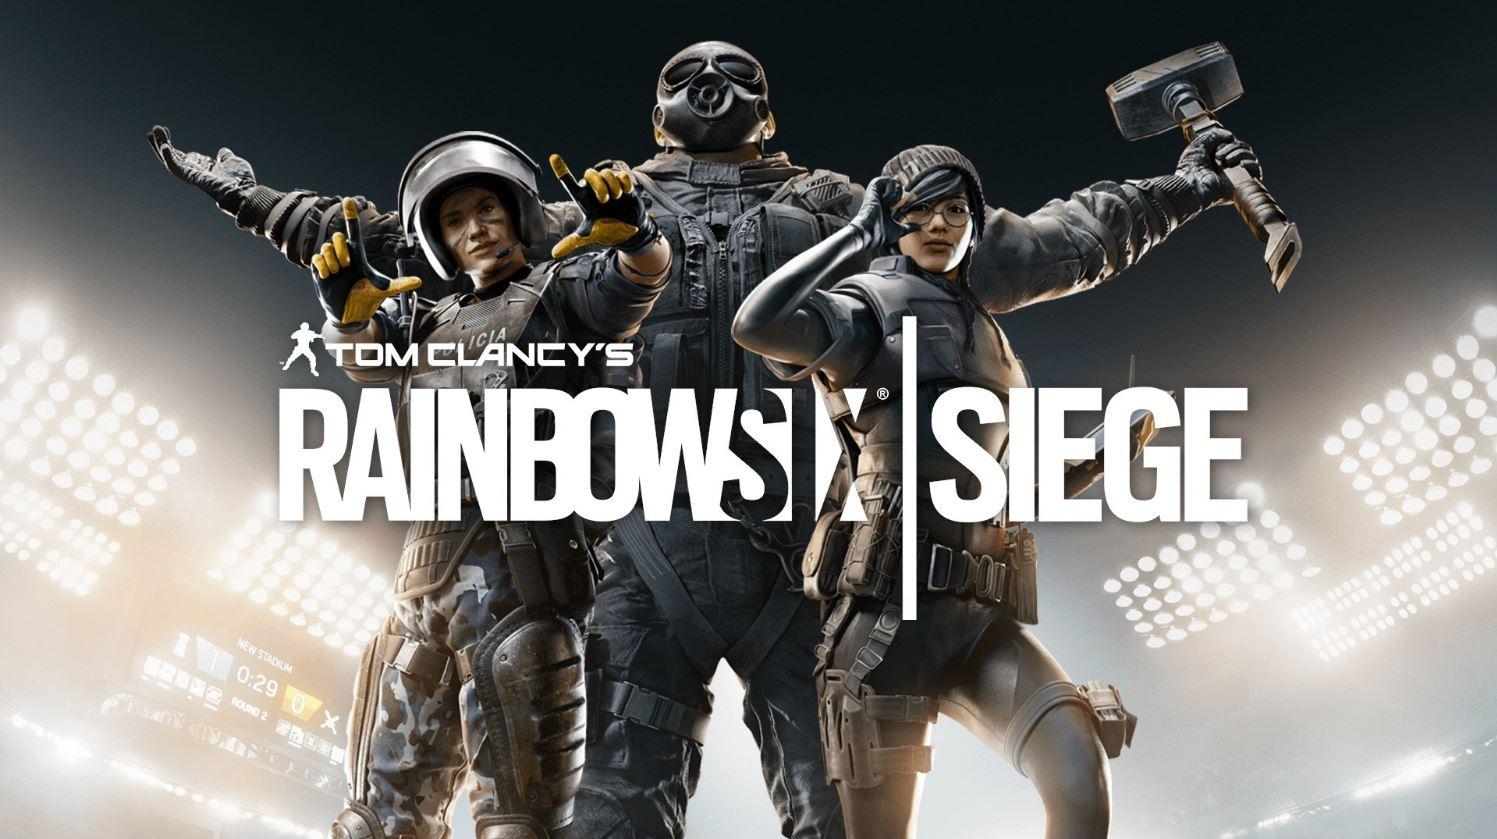 1ª Copa Playstation de Rainbow Six Siege inicia esta semana; inscreva-se